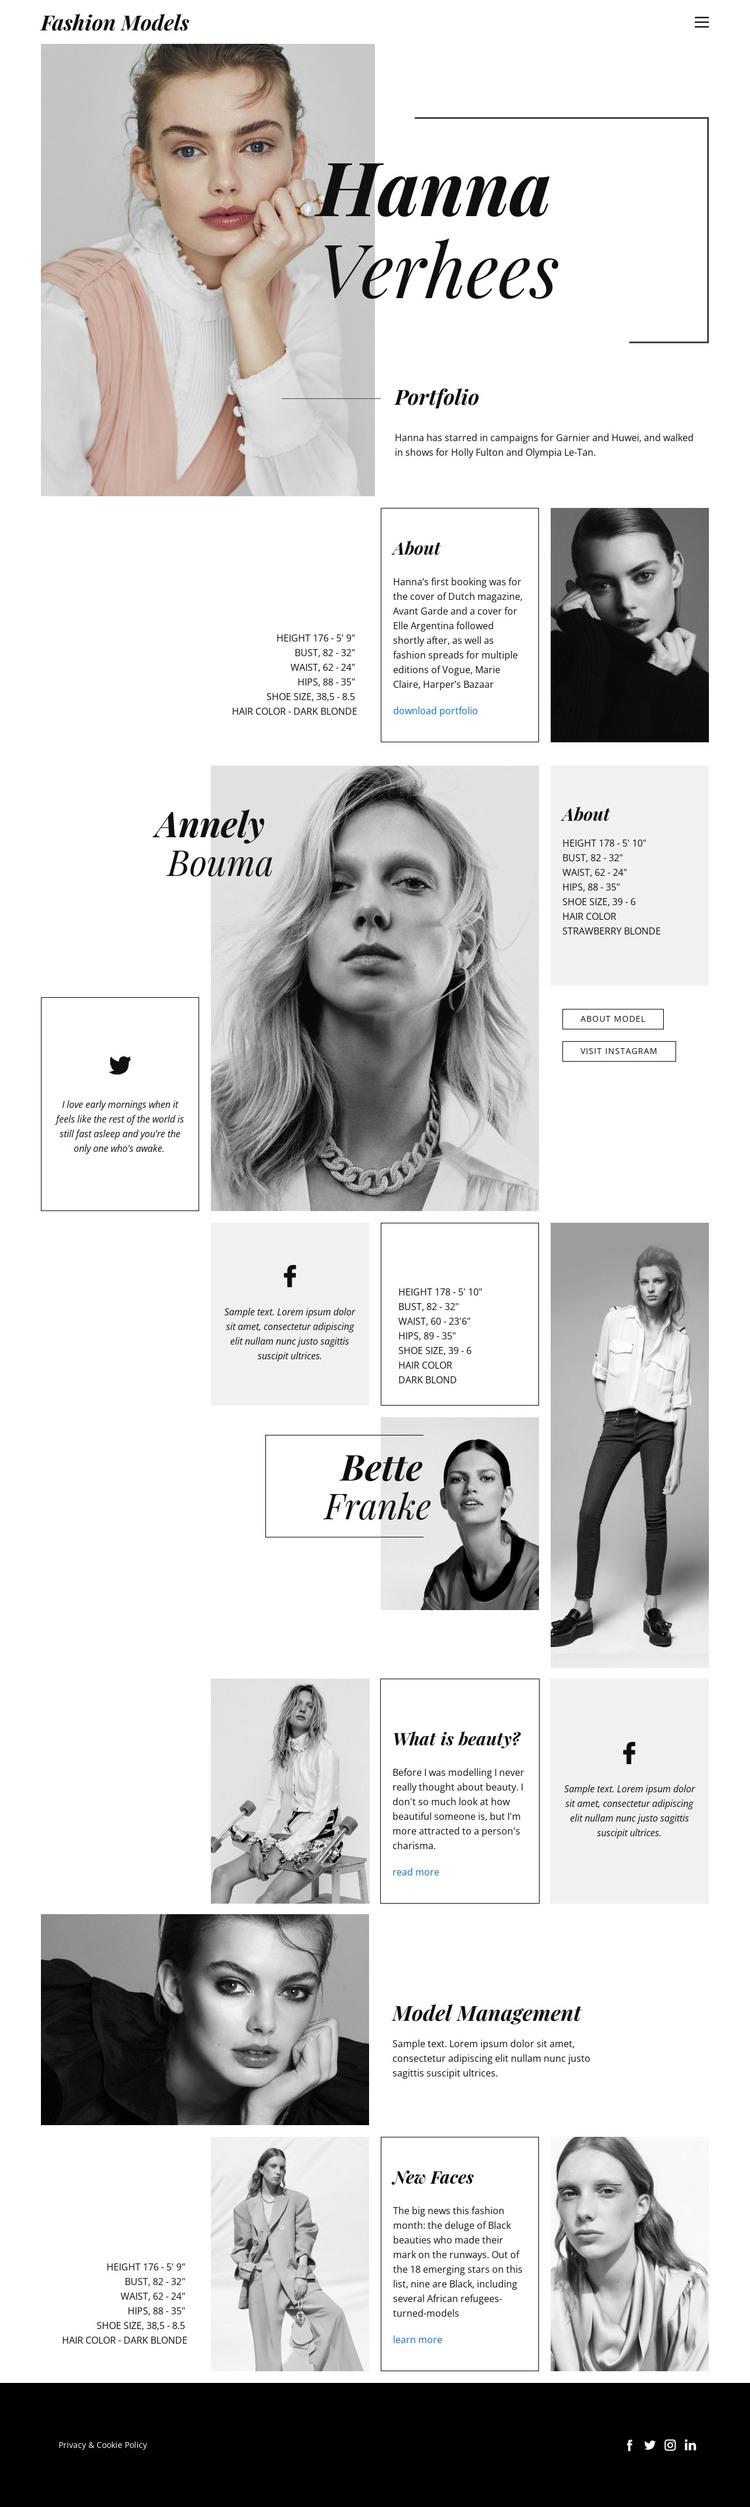 Hanna Verhees Blog HTML Template